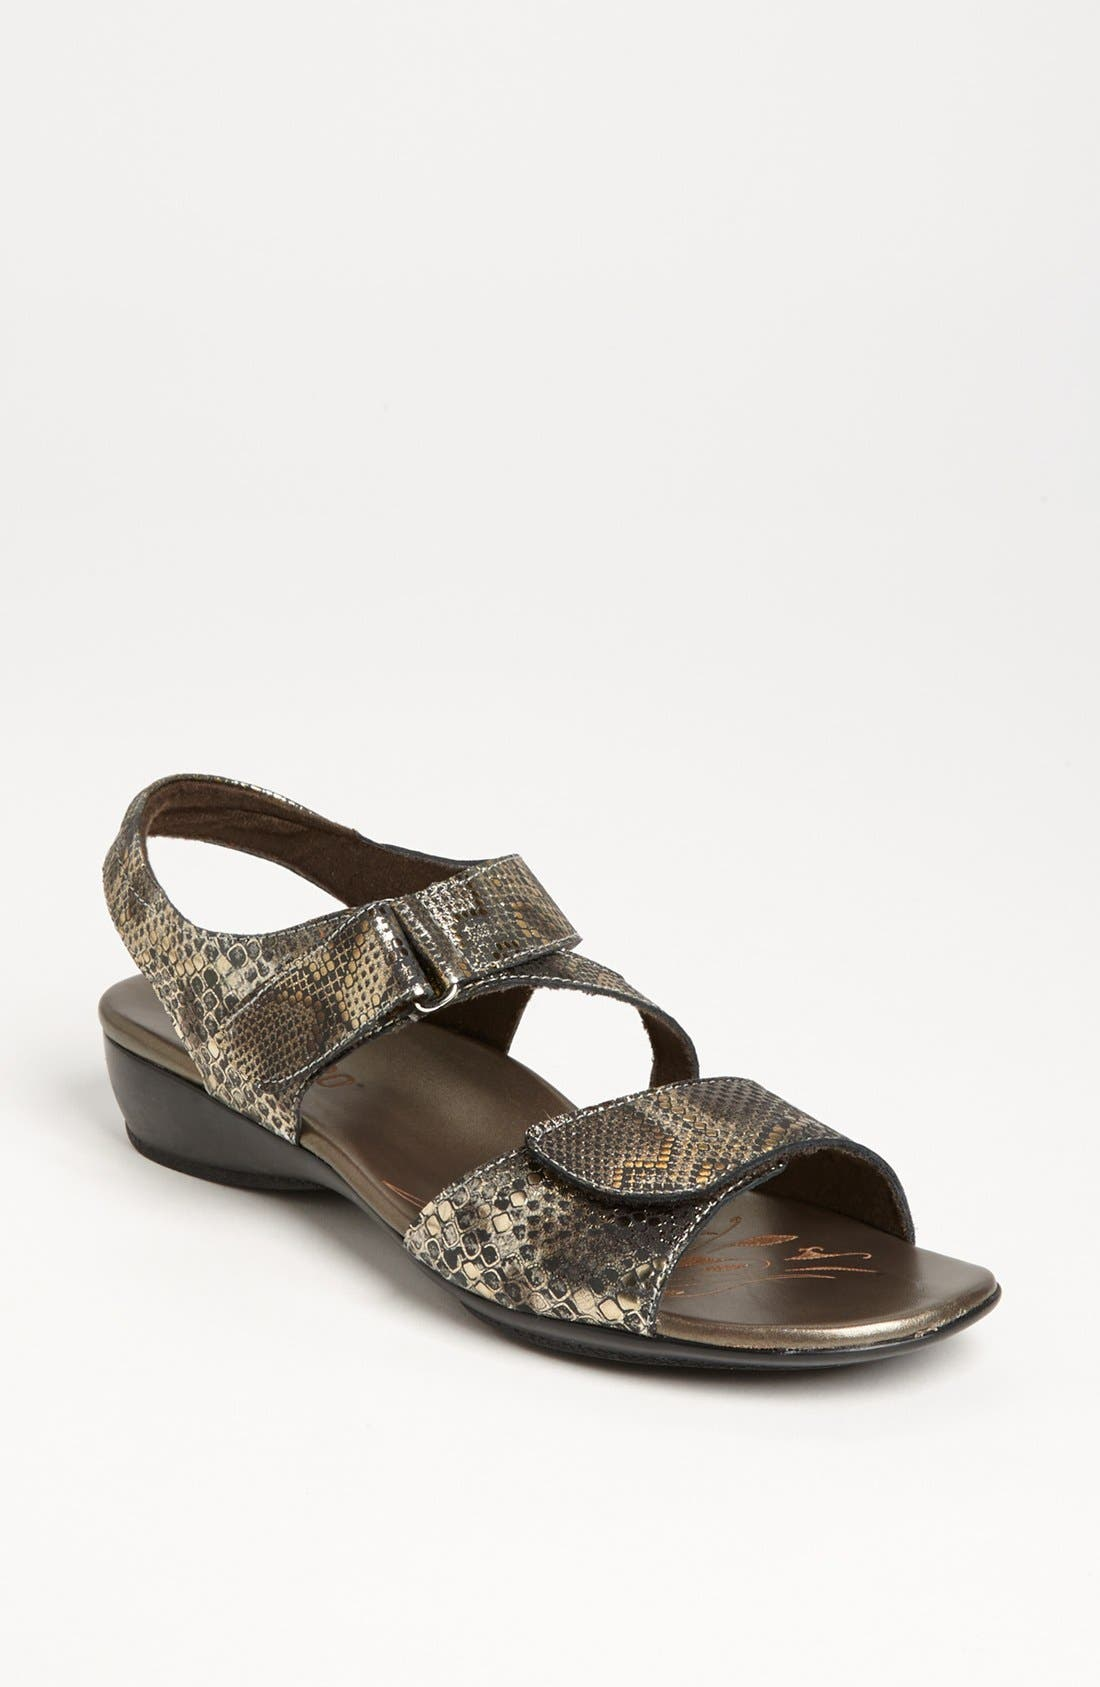 Alternate Image 1 Selected - Munro 'Brenna' Sandal